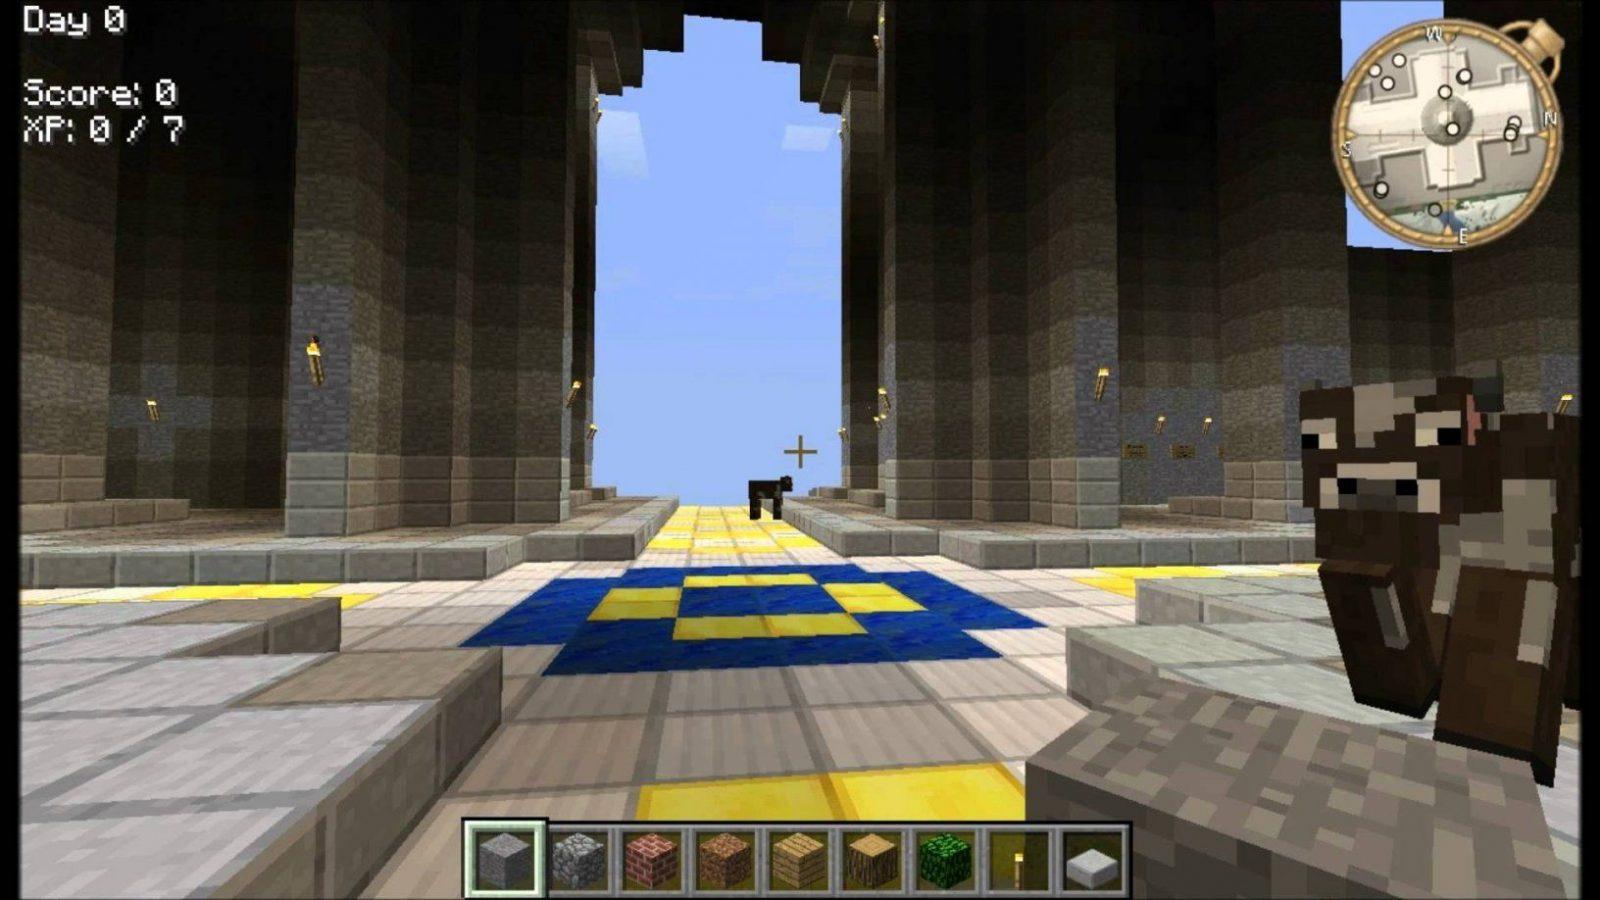 Huge Random Minecraft Castle Seed In Discription  Youtube von Minecraft Seeds Ps4 Castle Photo